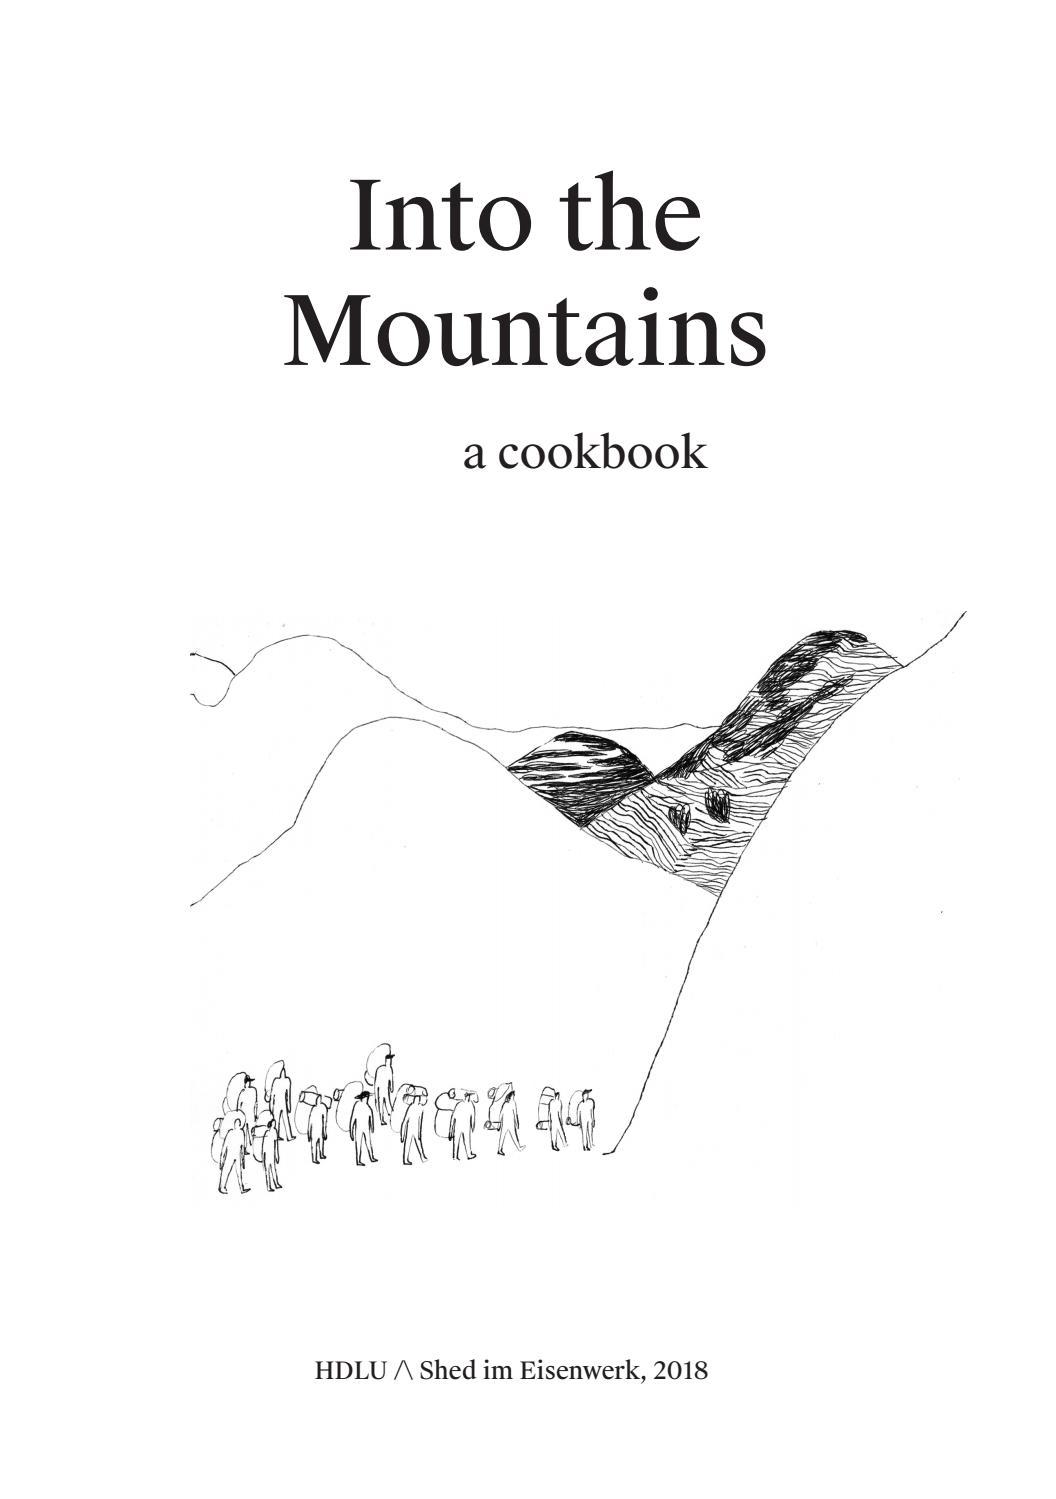 101 Dalmatians Porn Comic projekt i izložba: u planinama / in the mountainshdlu